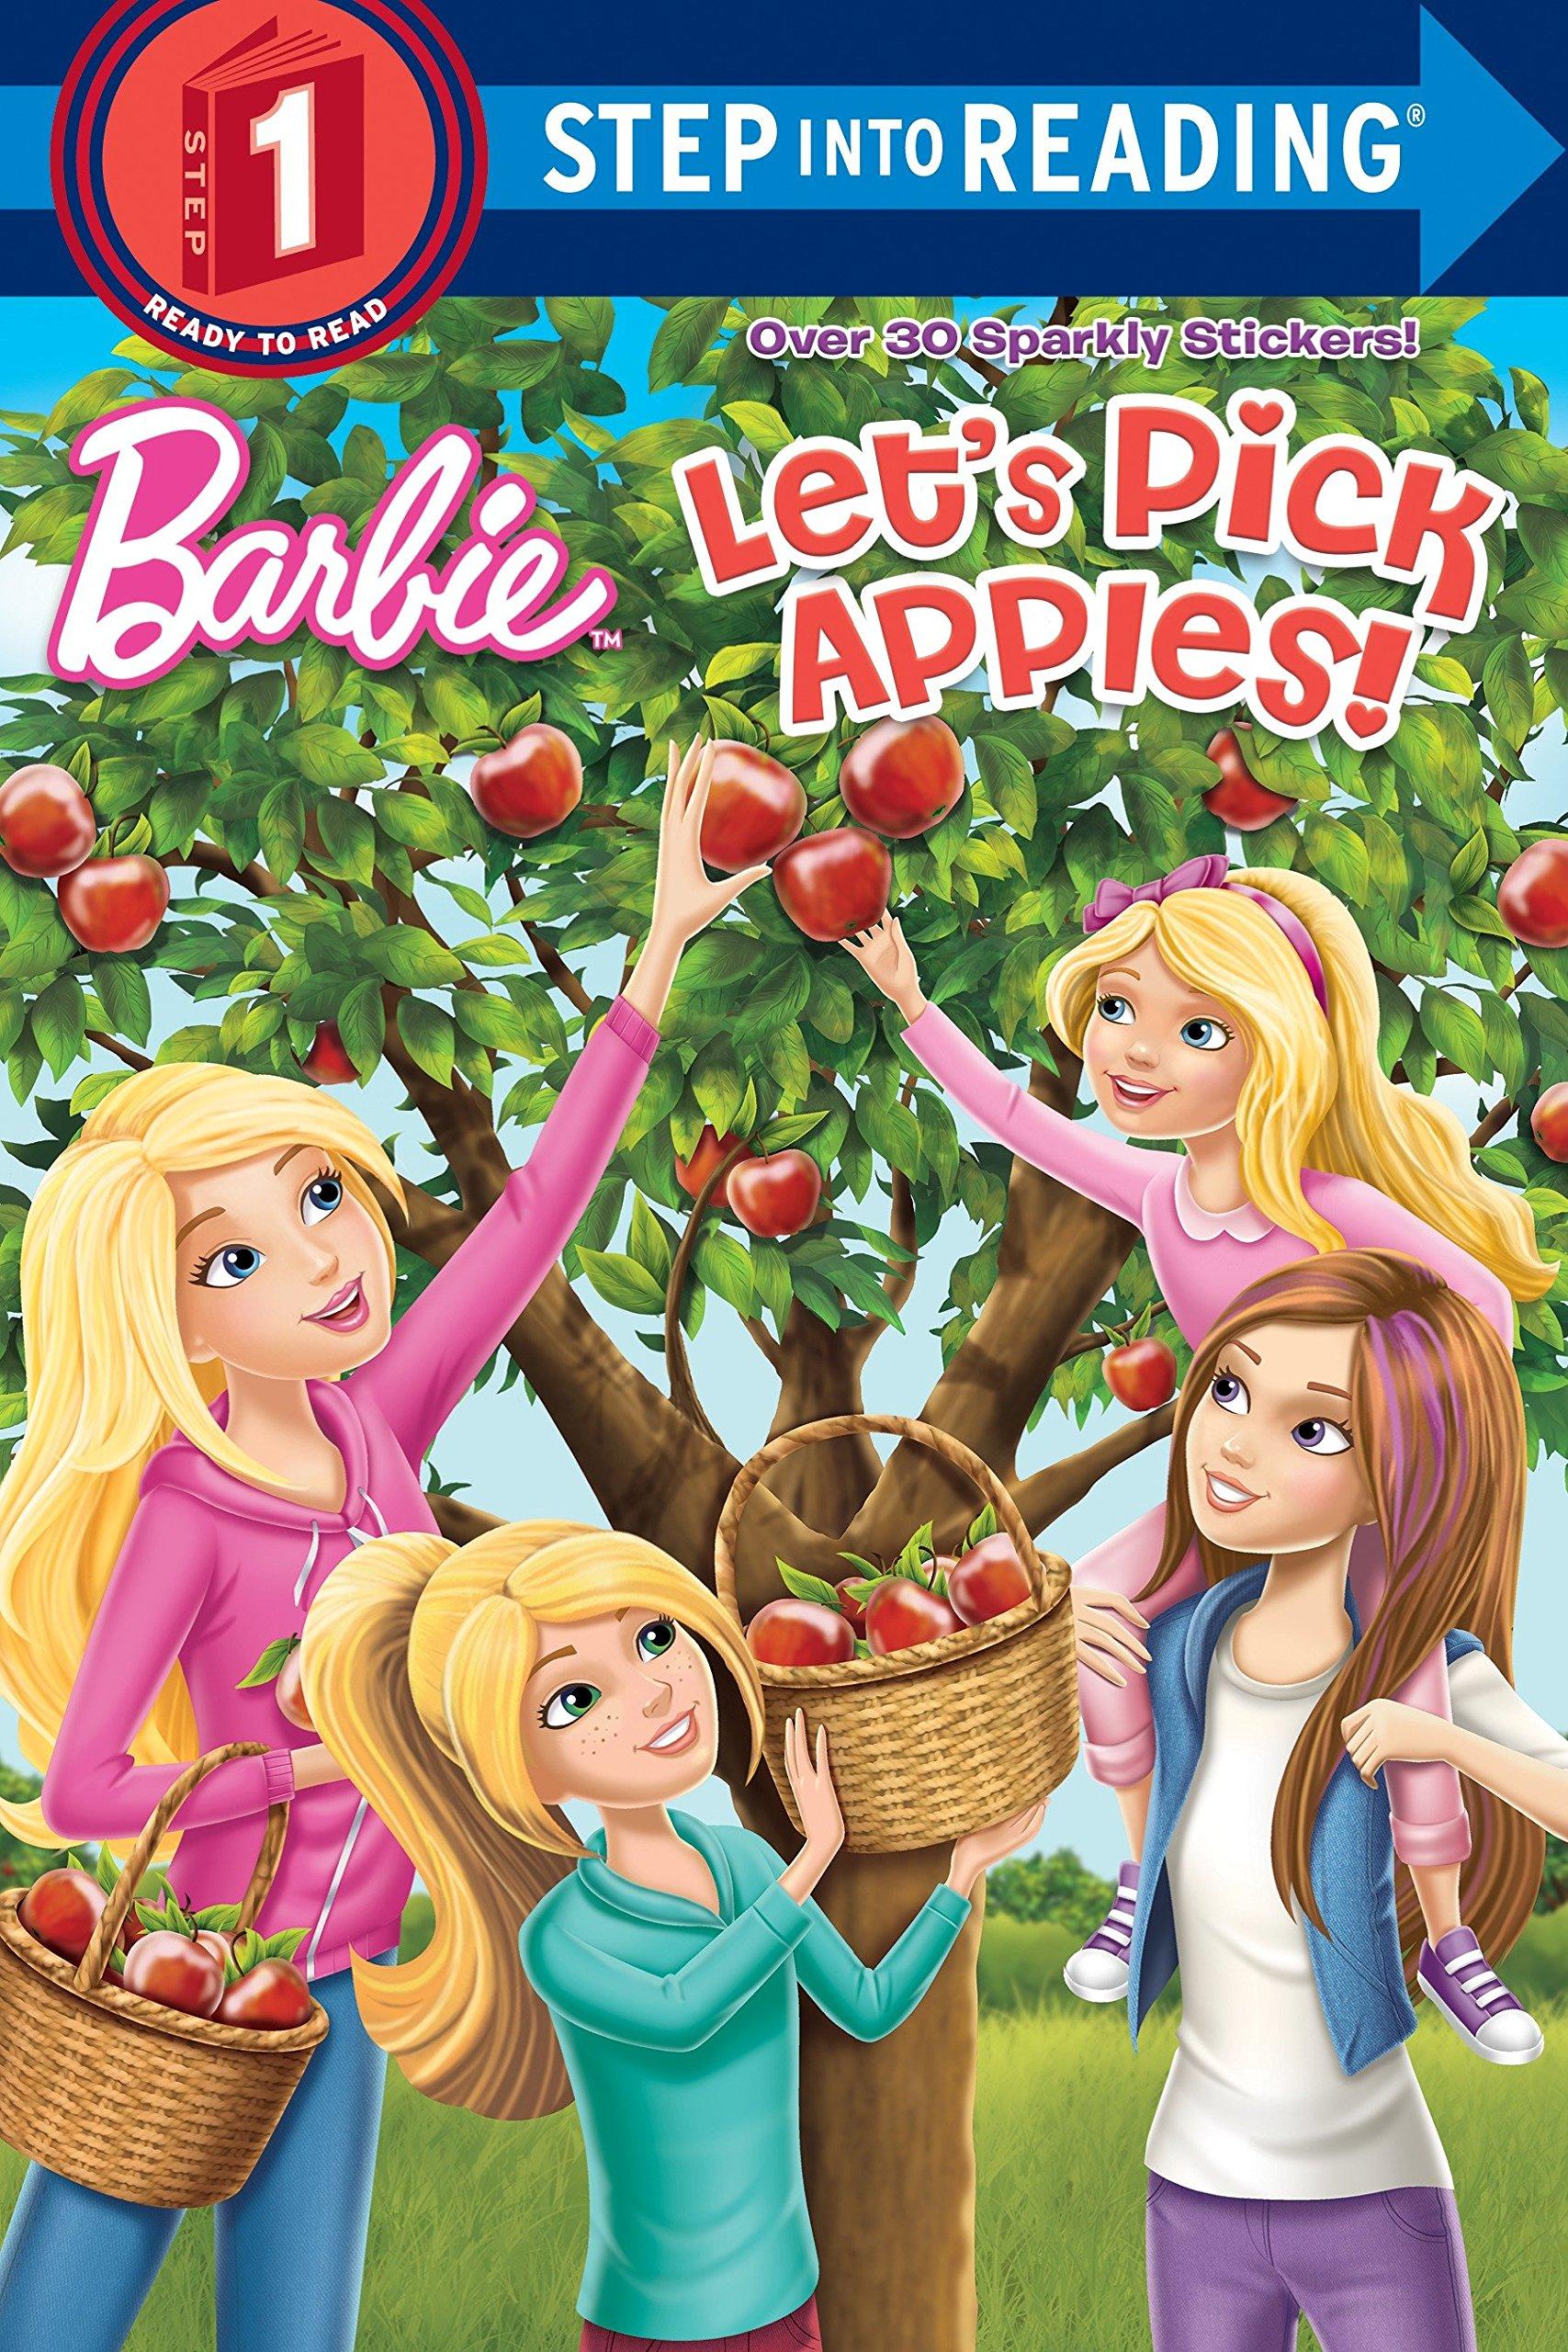 Let's Pick Apples! (Barbie) (Step into Reading) pdf epub